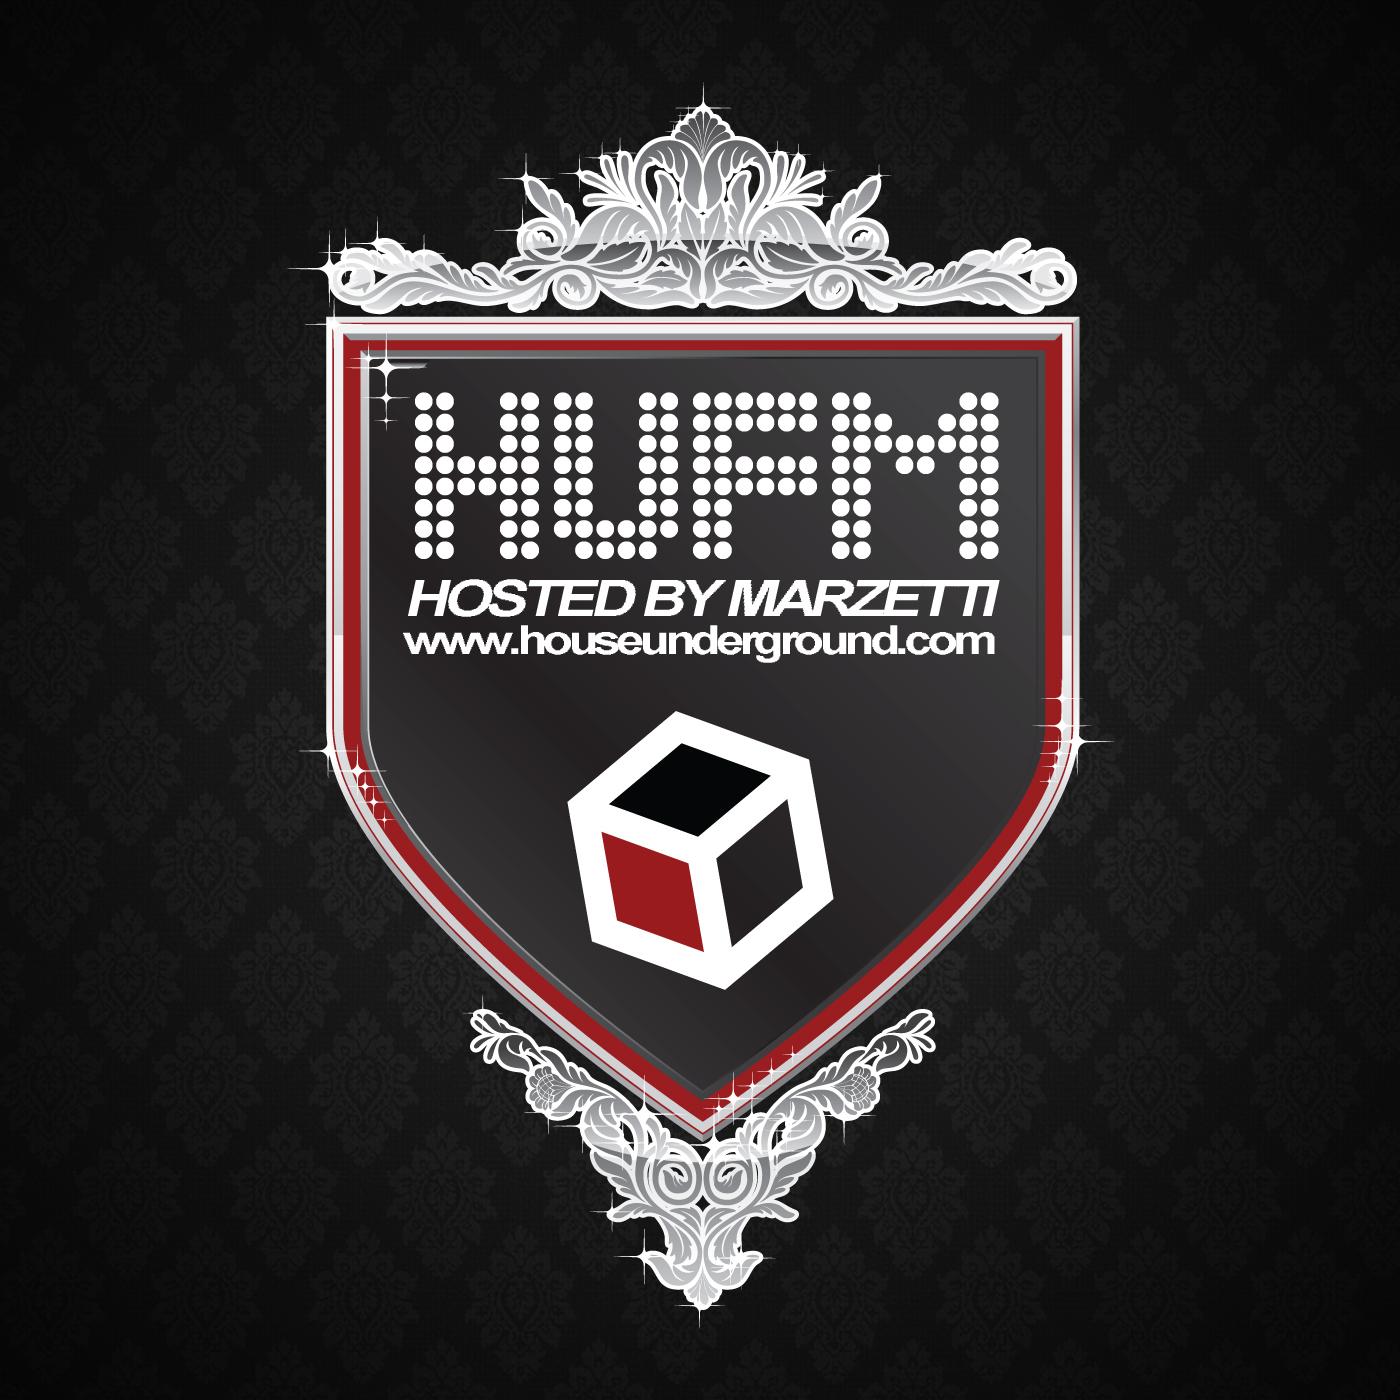 Artwork for House Underground FM (HUFM) December 5th 2009